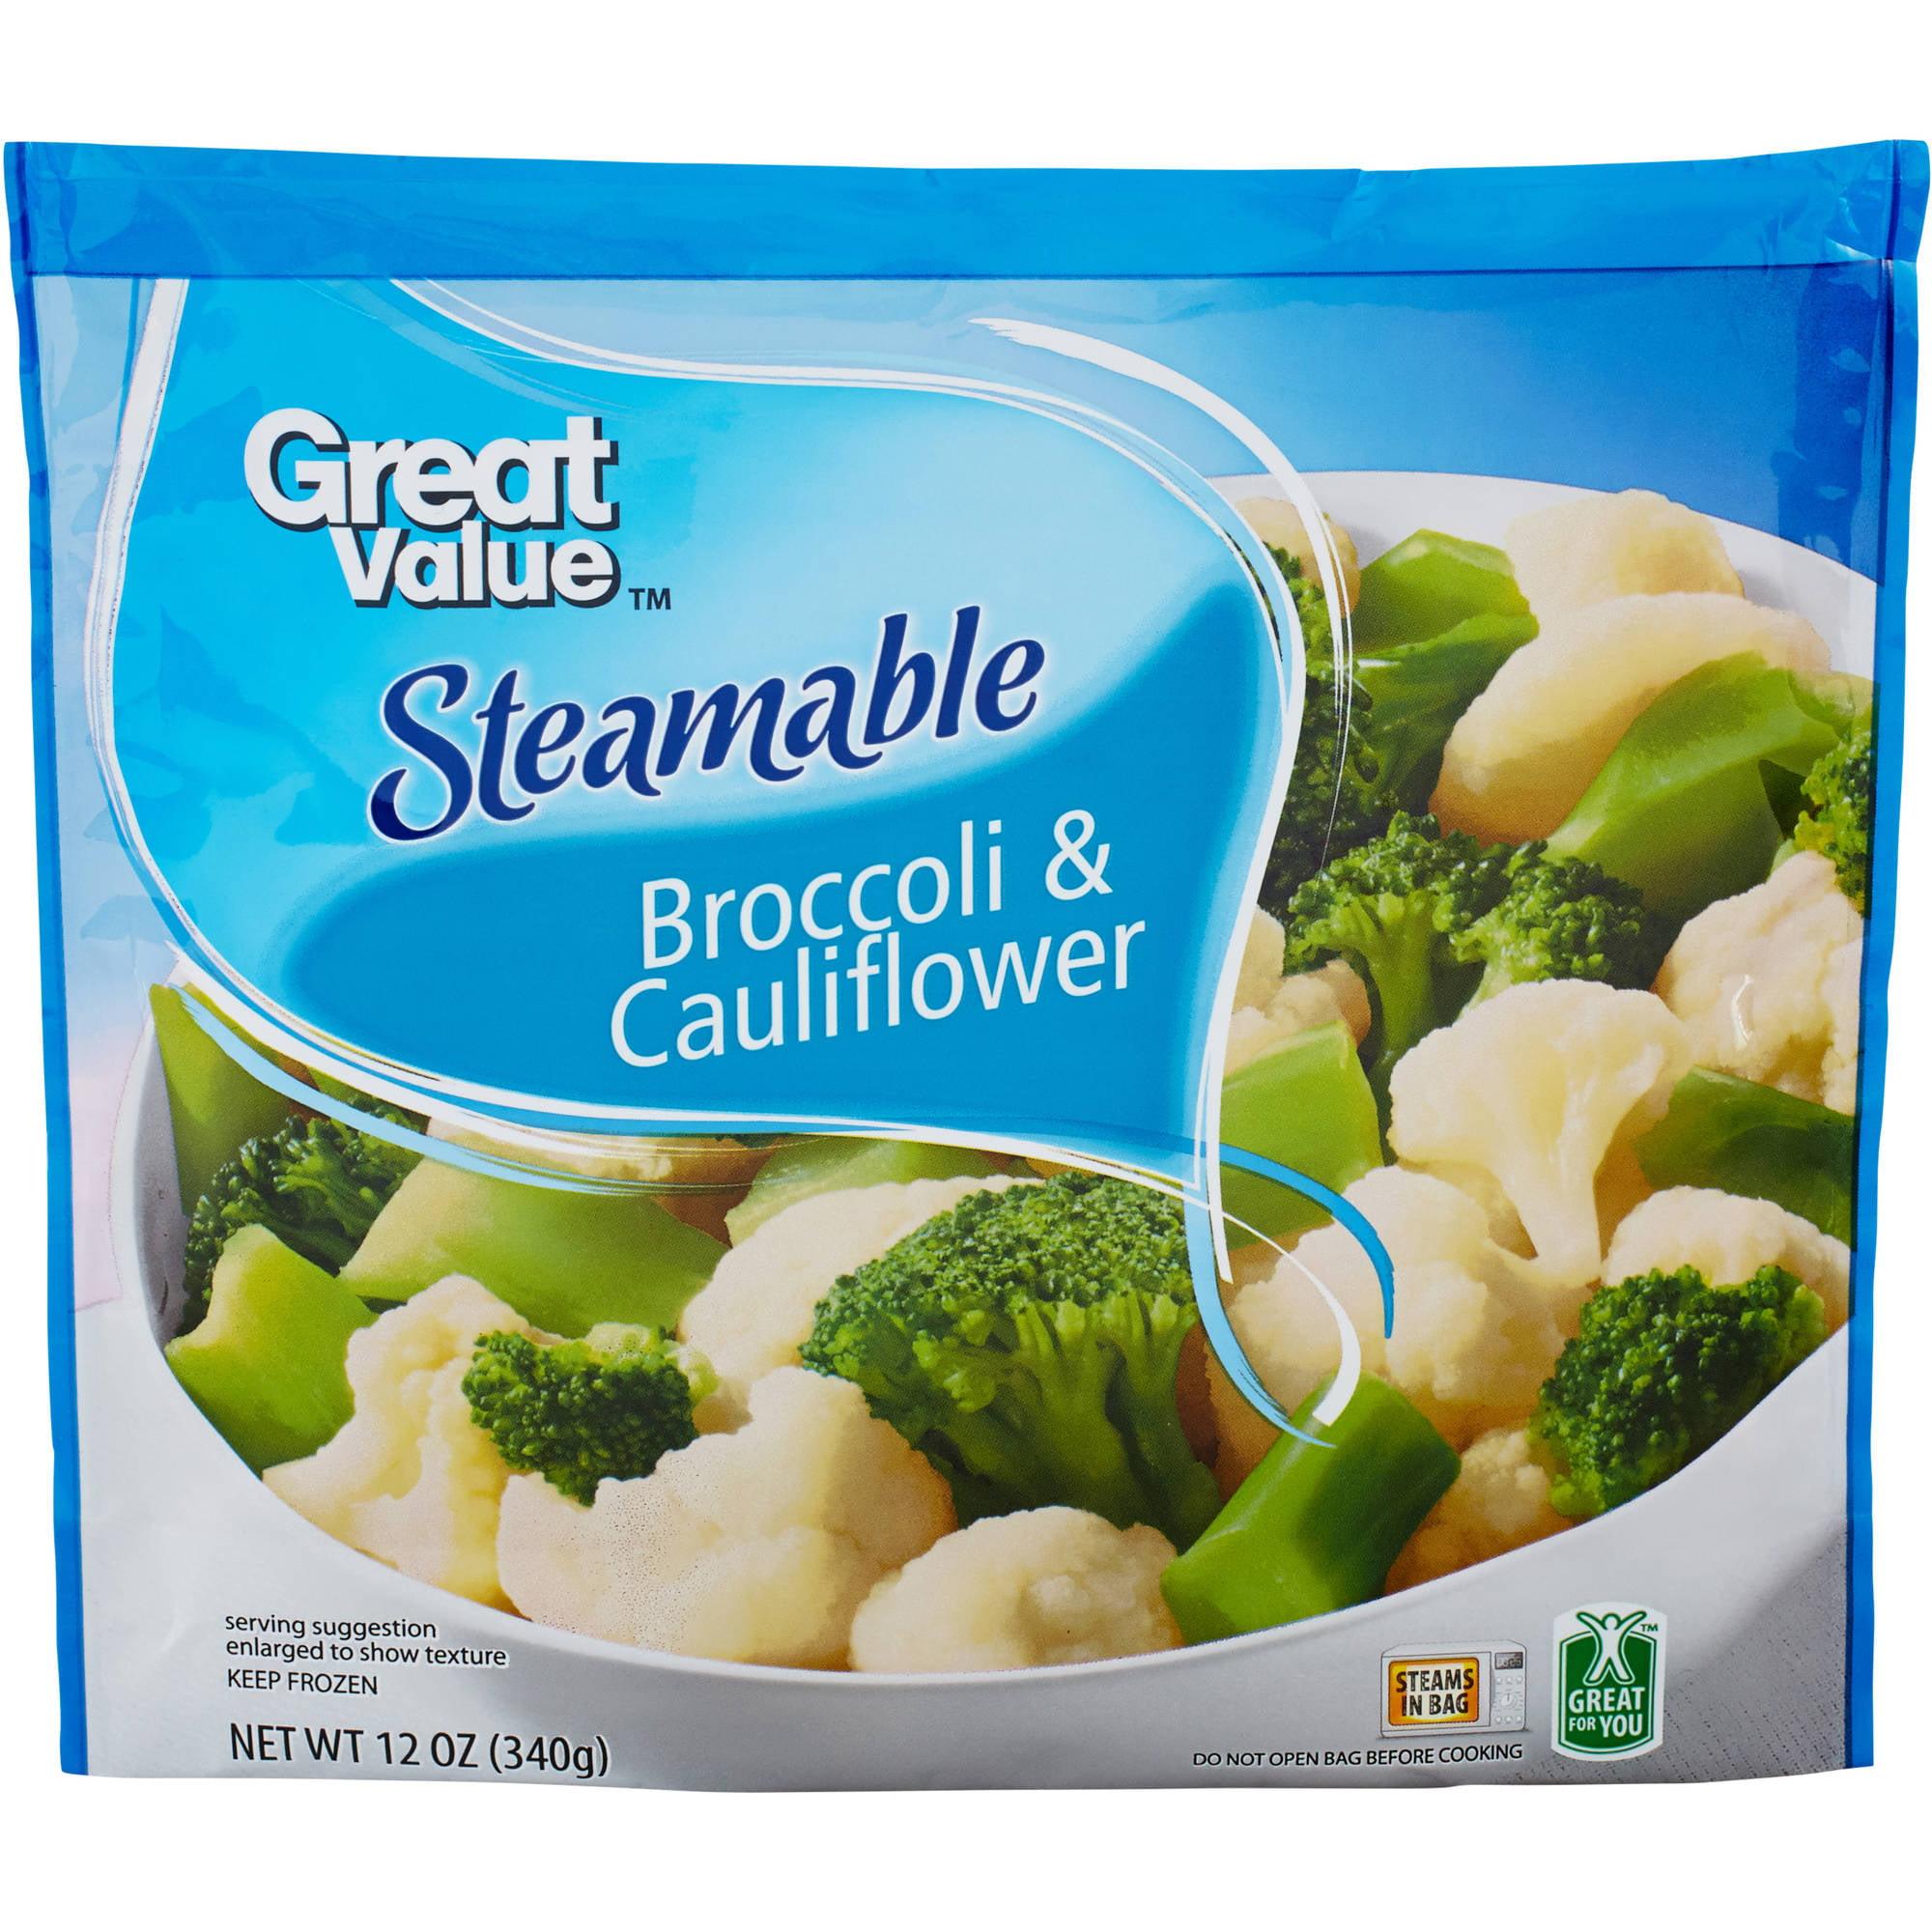 Great Value: Steamable Broccoli & Cauliflower, 12 Oz